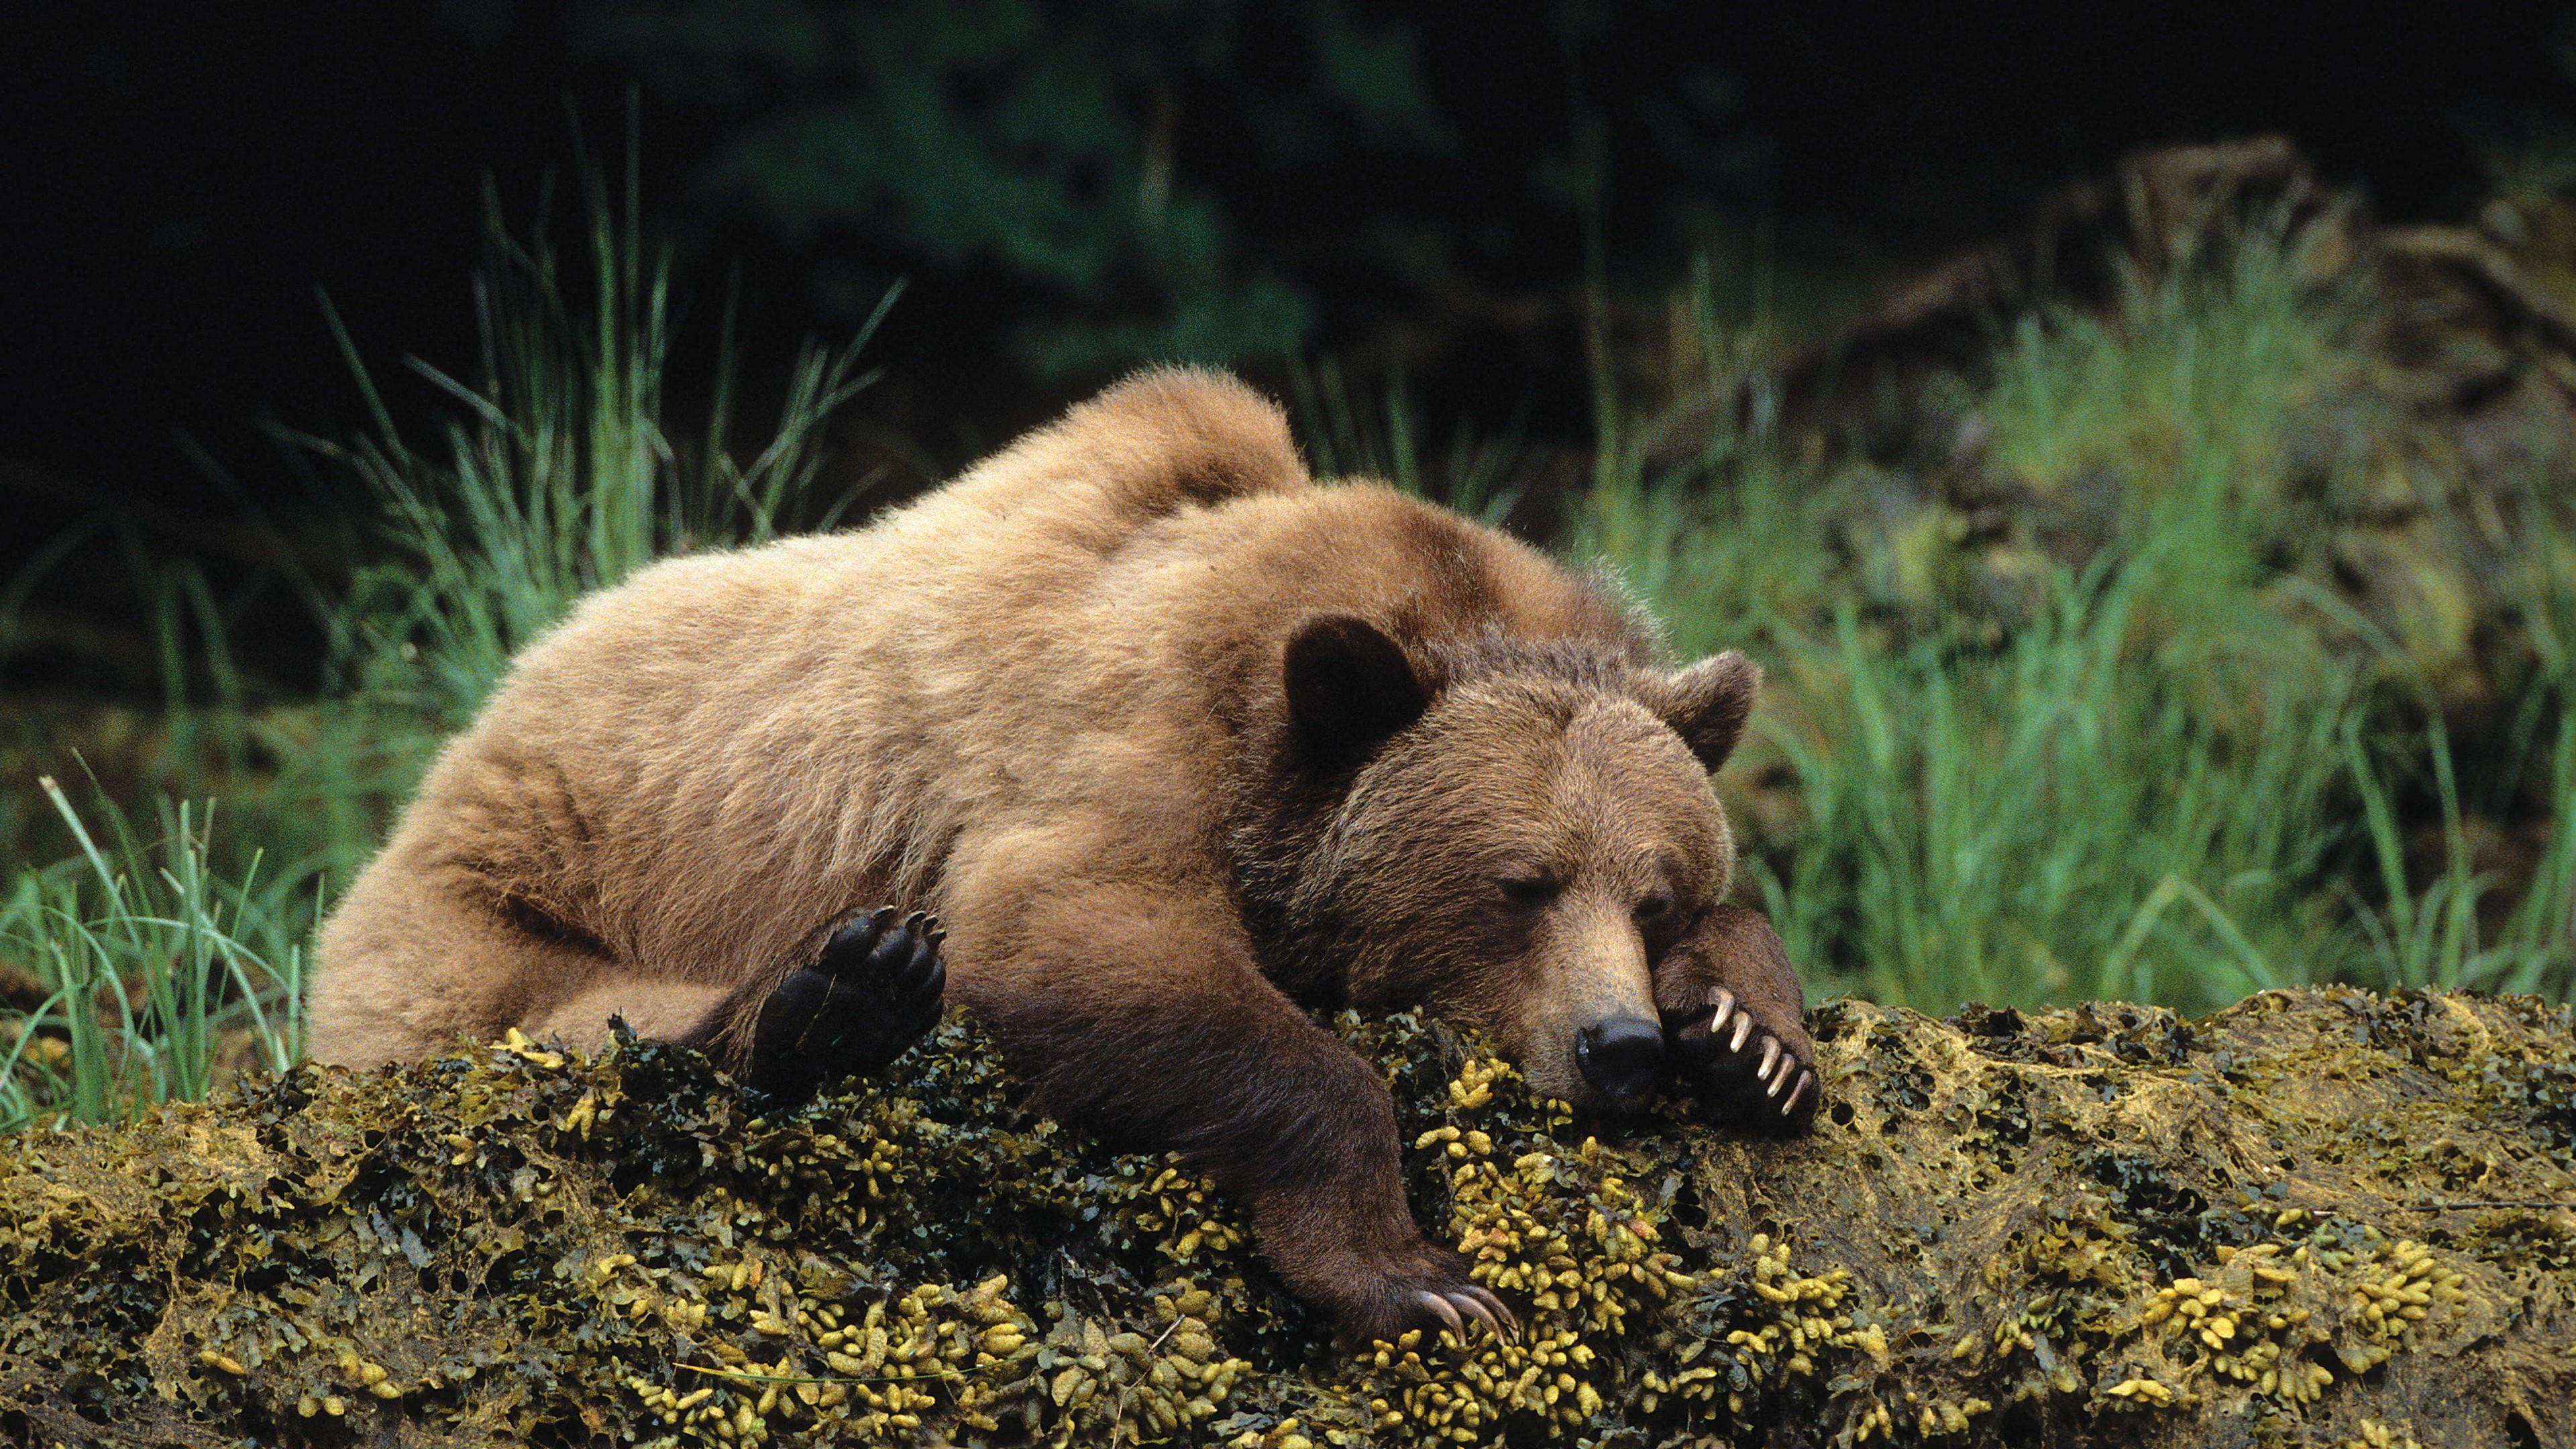 Sleeping brown bear  wallpaper